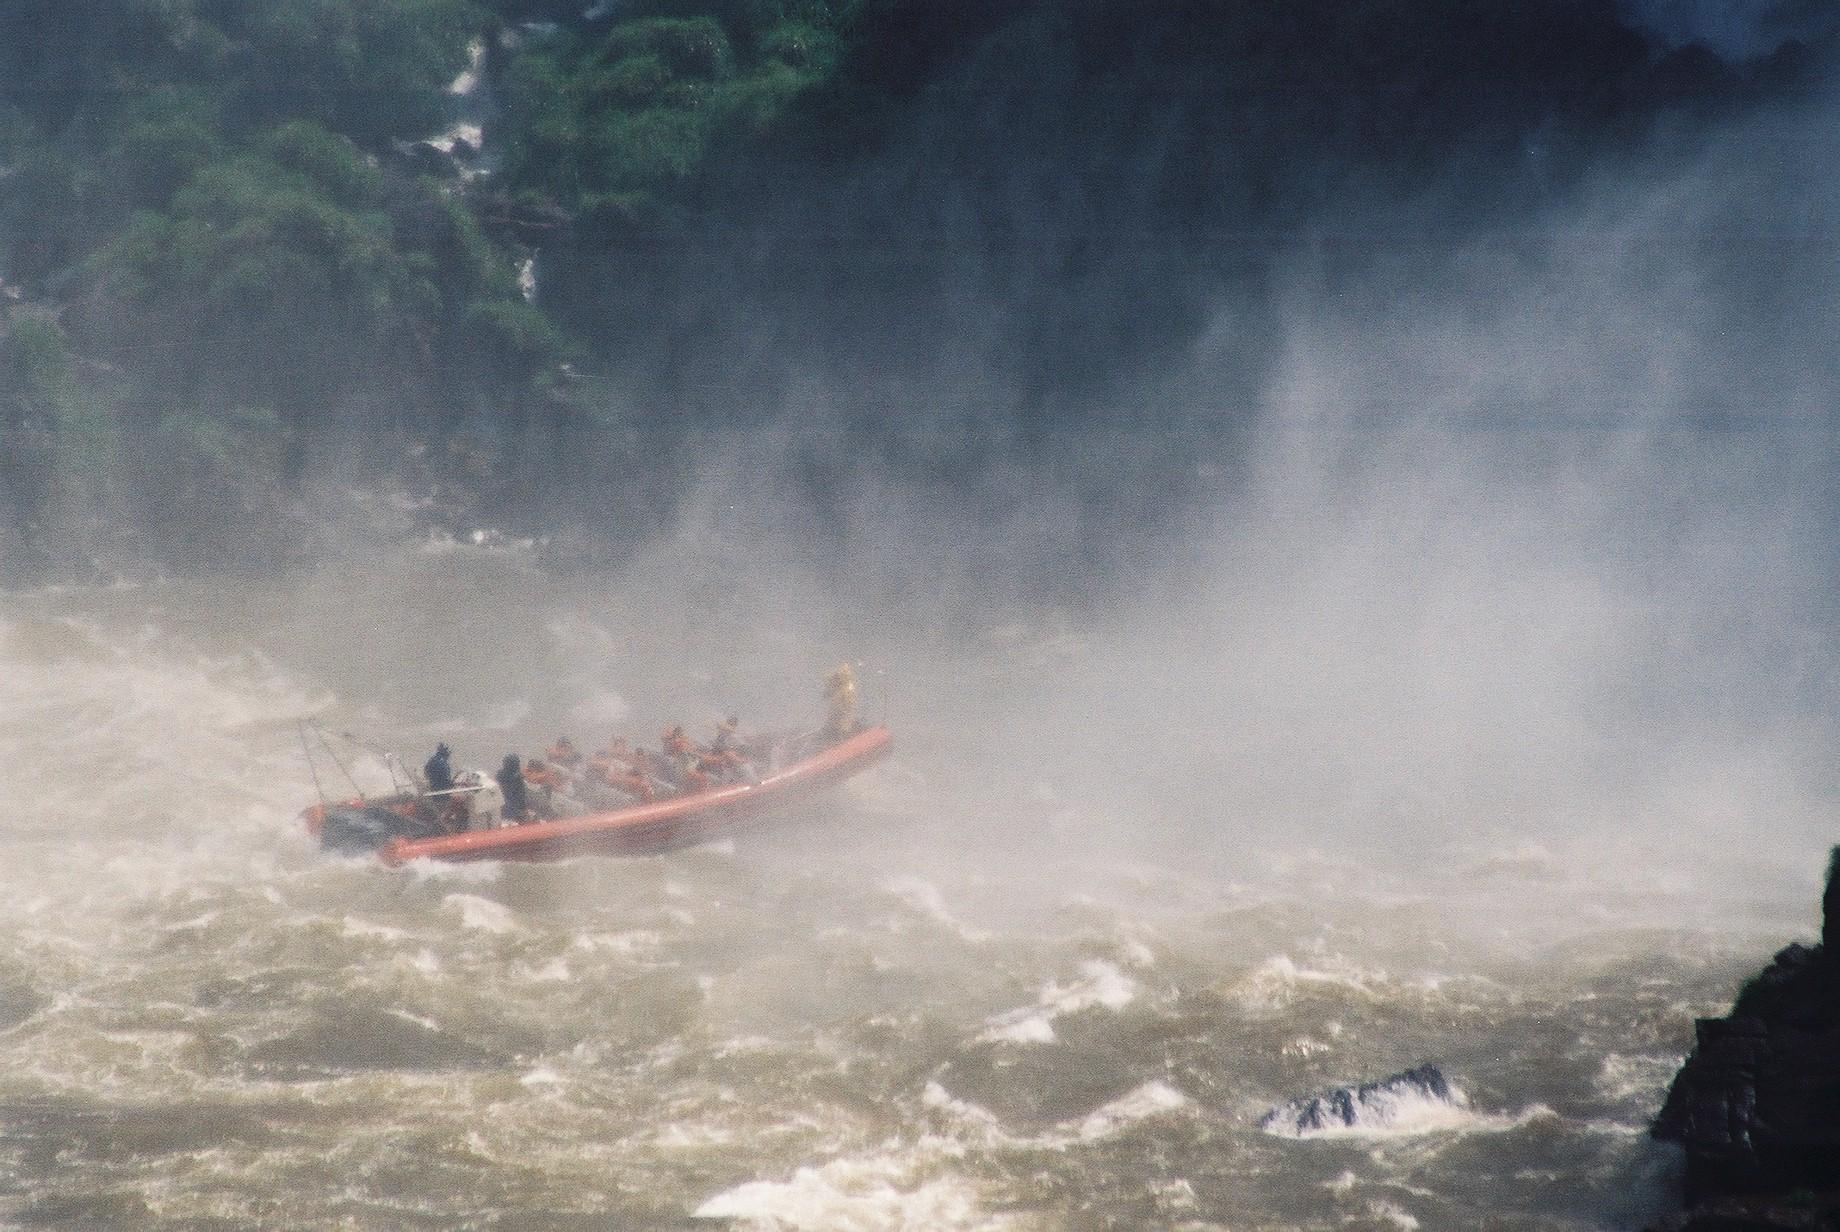 Tourist boat, Iguazu.JPG